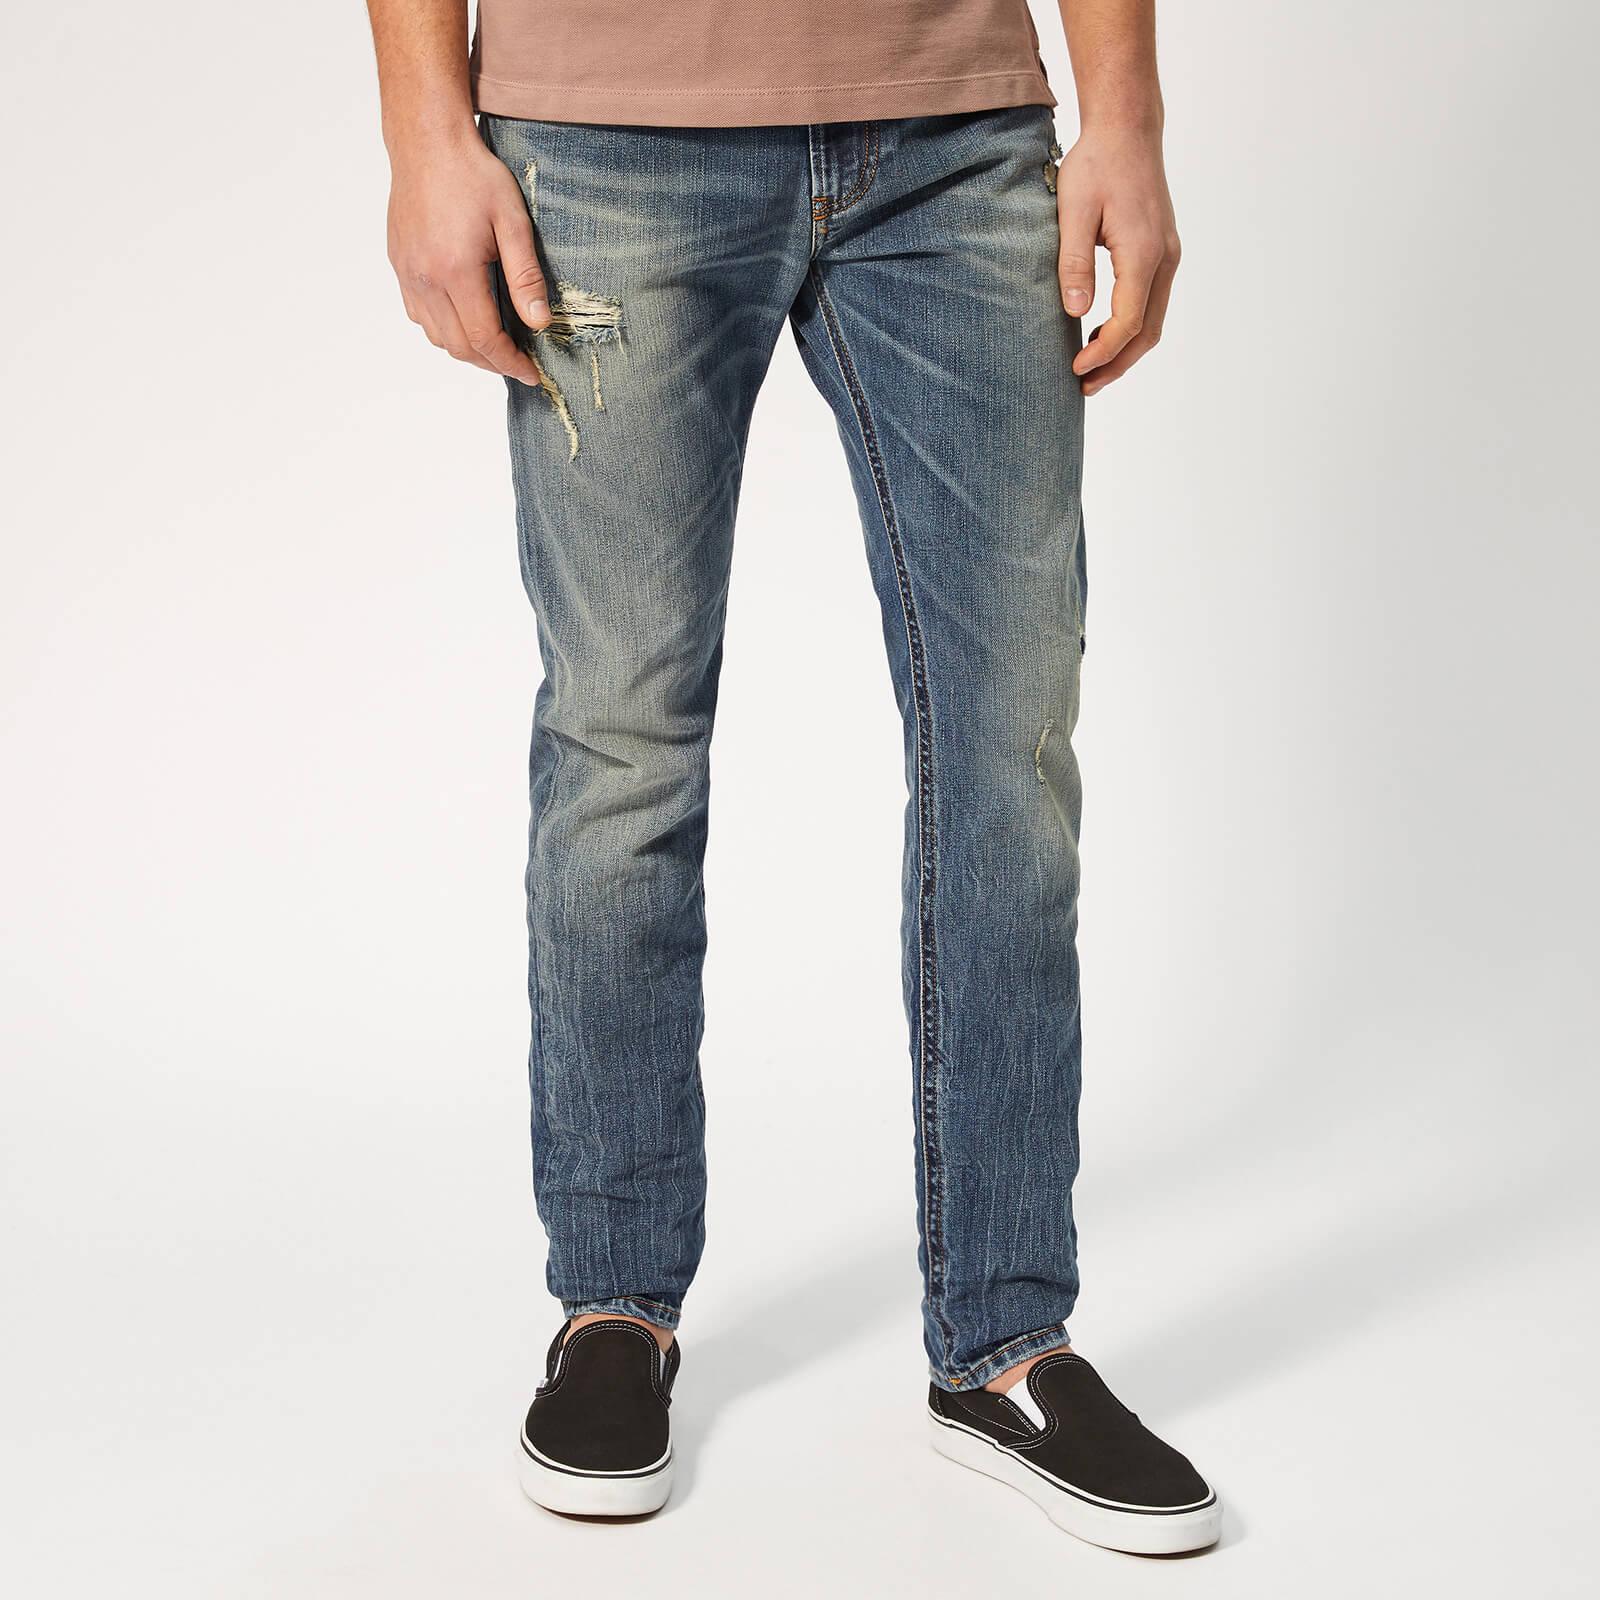 Diesel Men's Thommer Skinny Jeans - Blue - W32/L30 - Blue